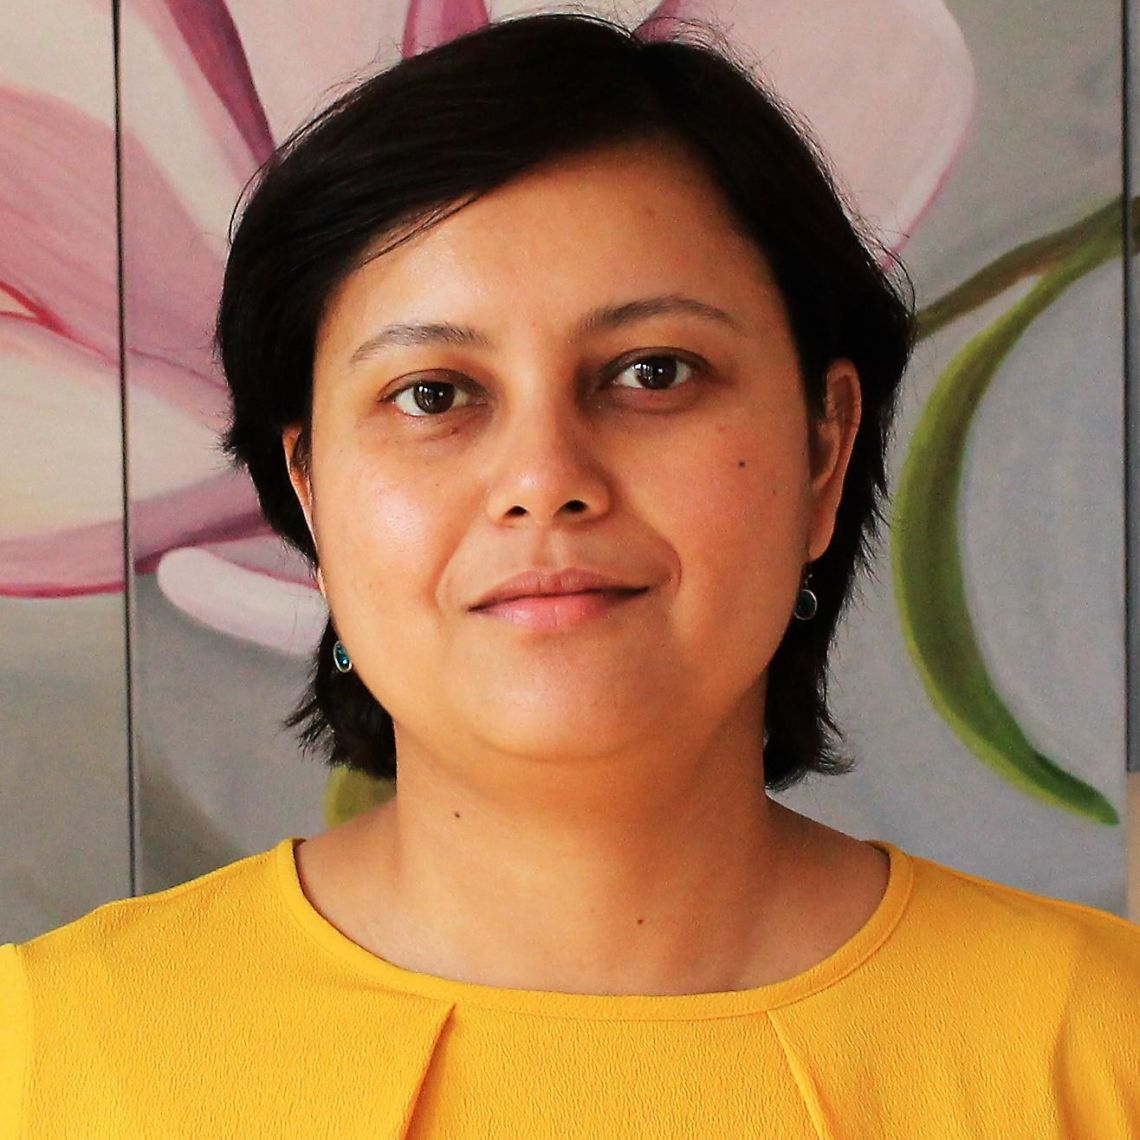 Associate Professor Manisha Nair